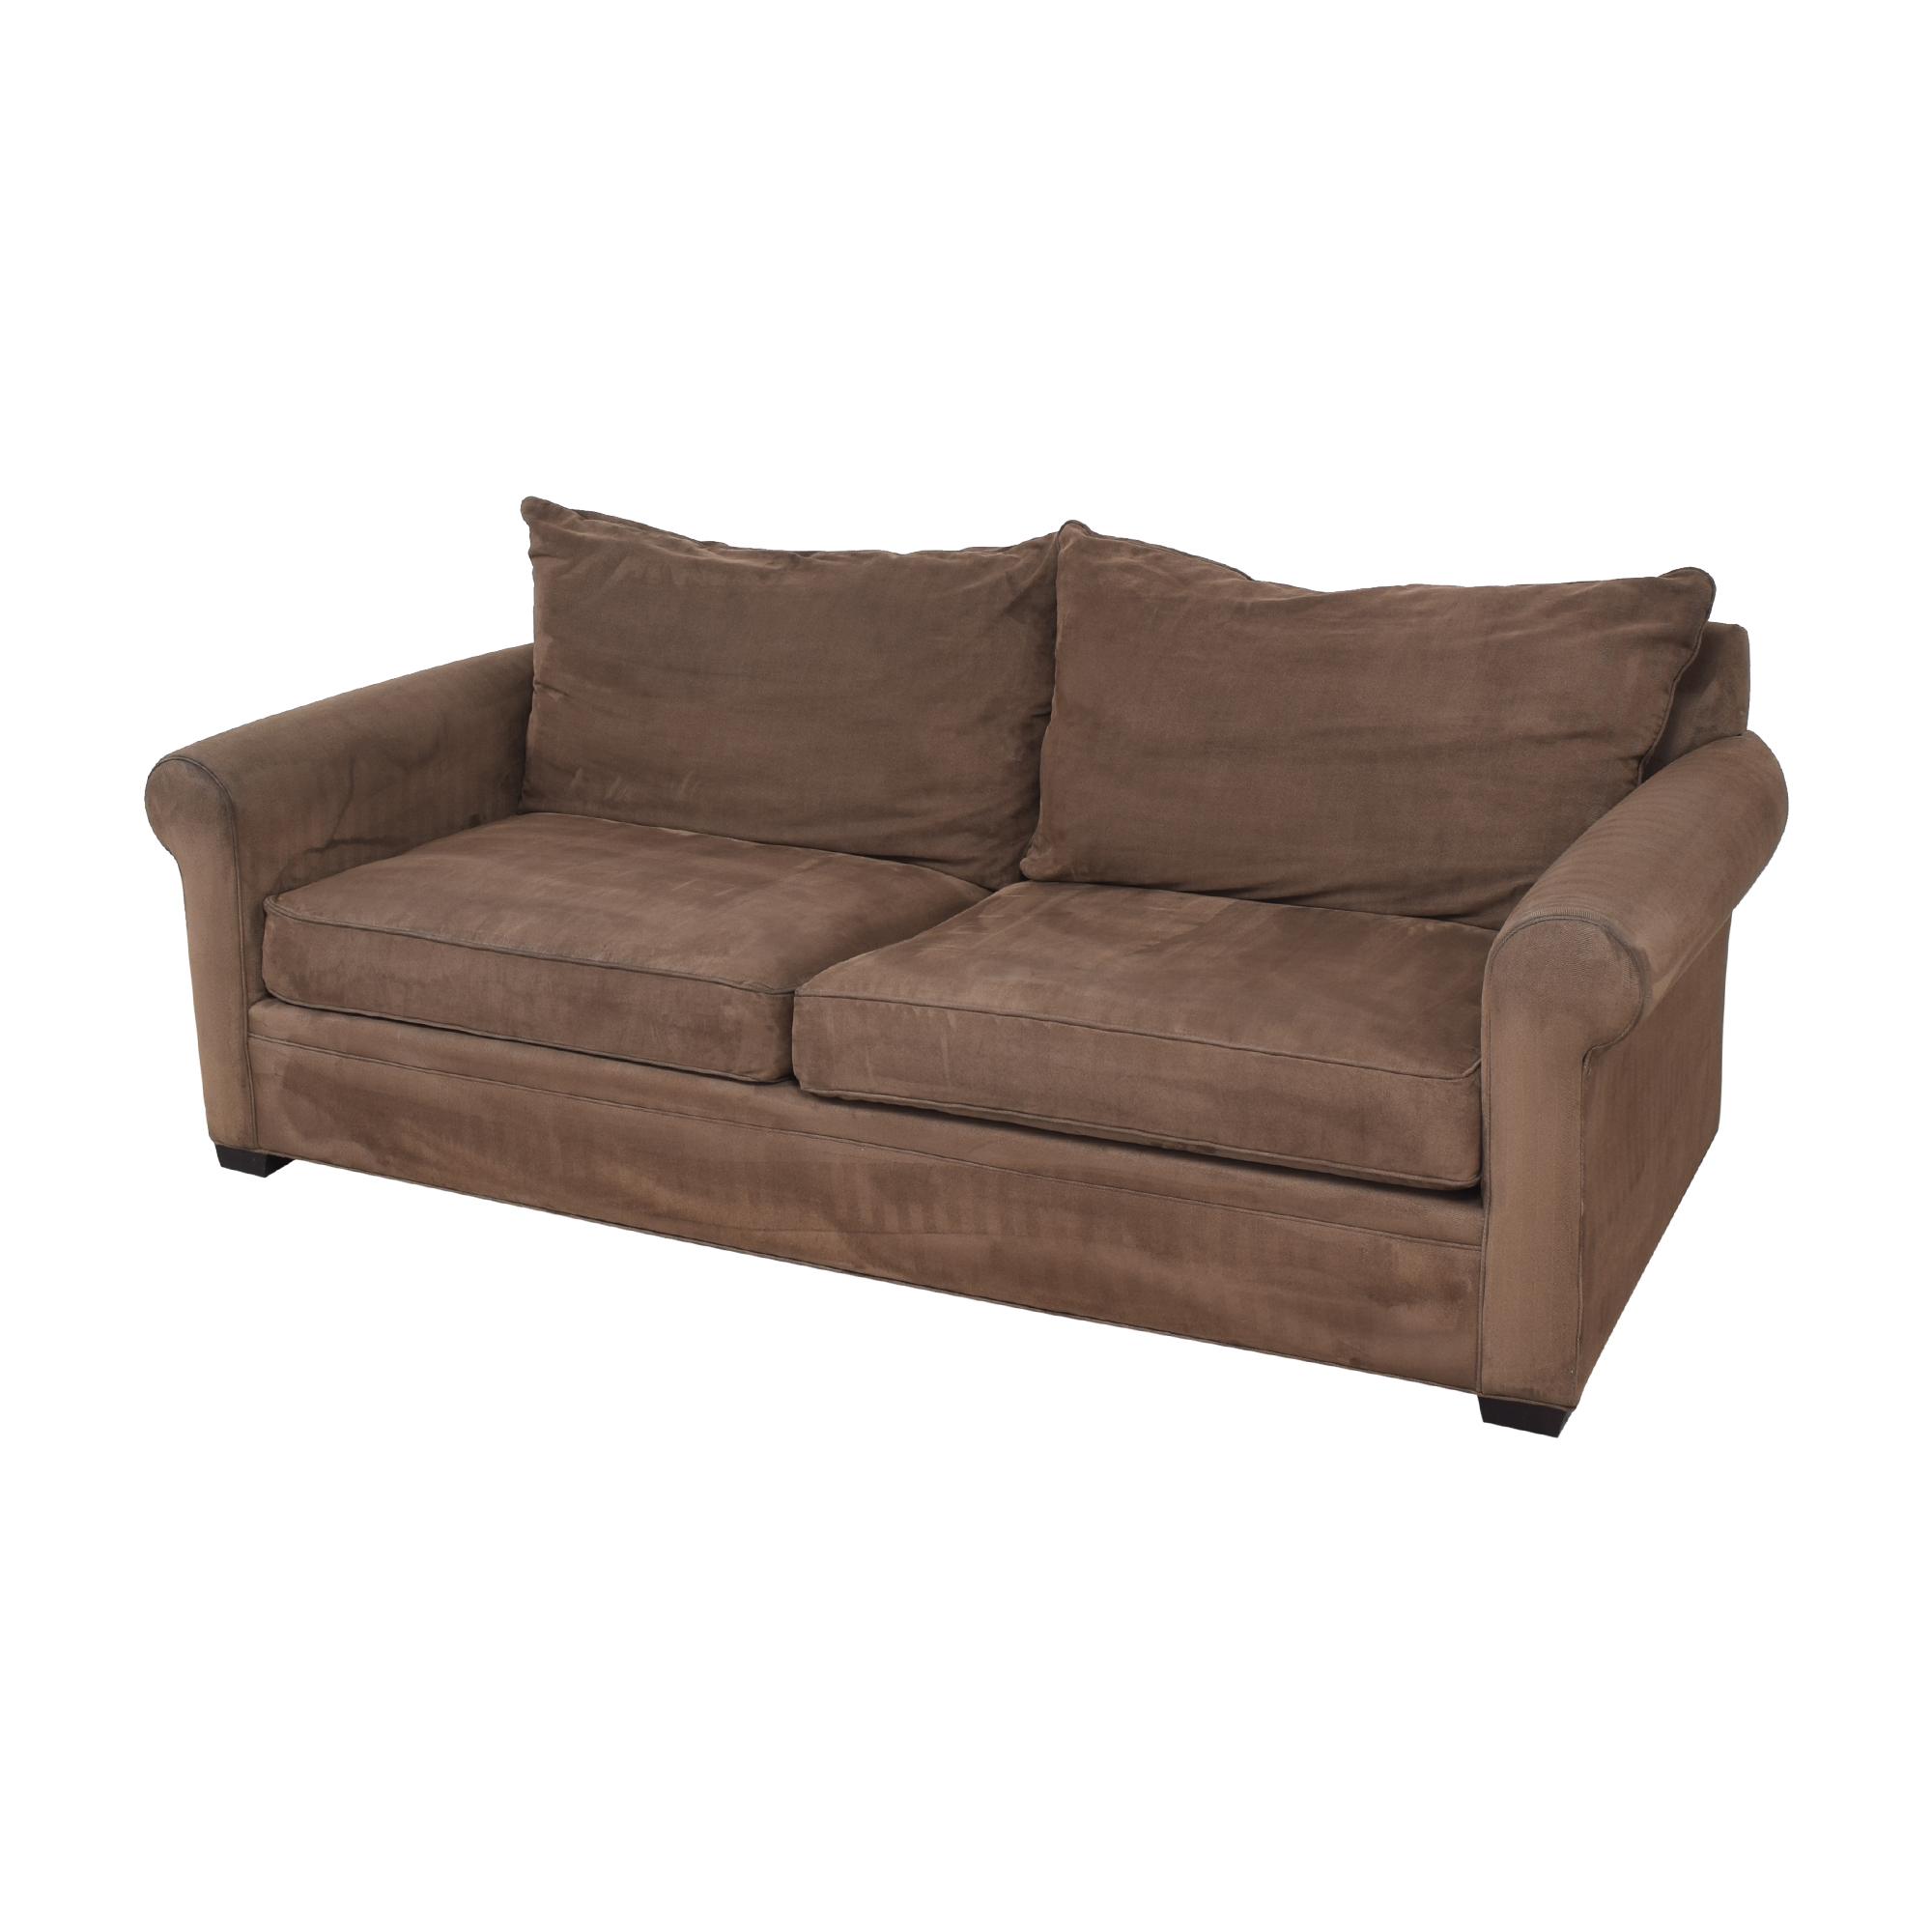 Macy's Macy's Modern Concepts Two Cushion Sofa coupon